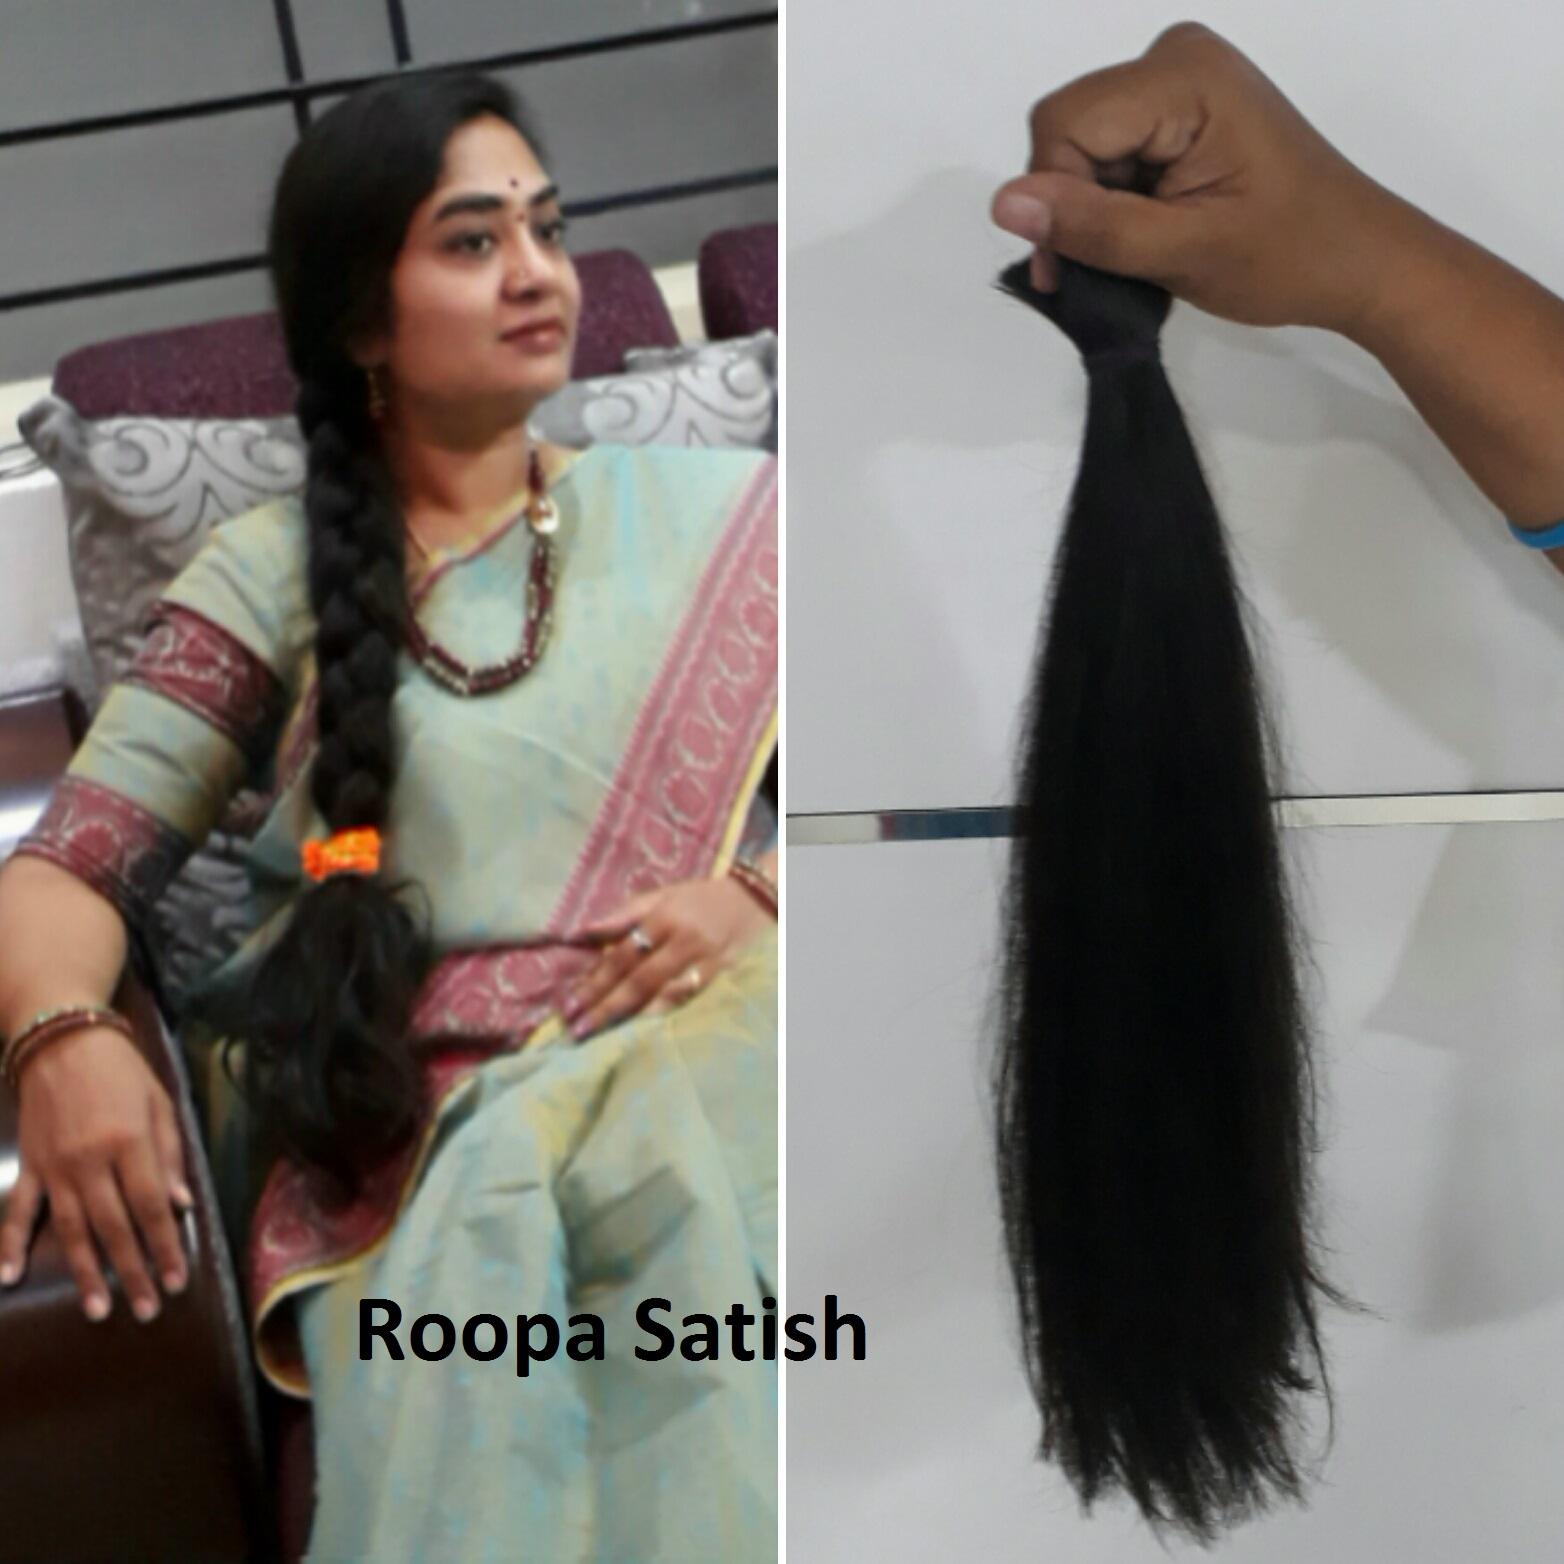 Roopa Satish